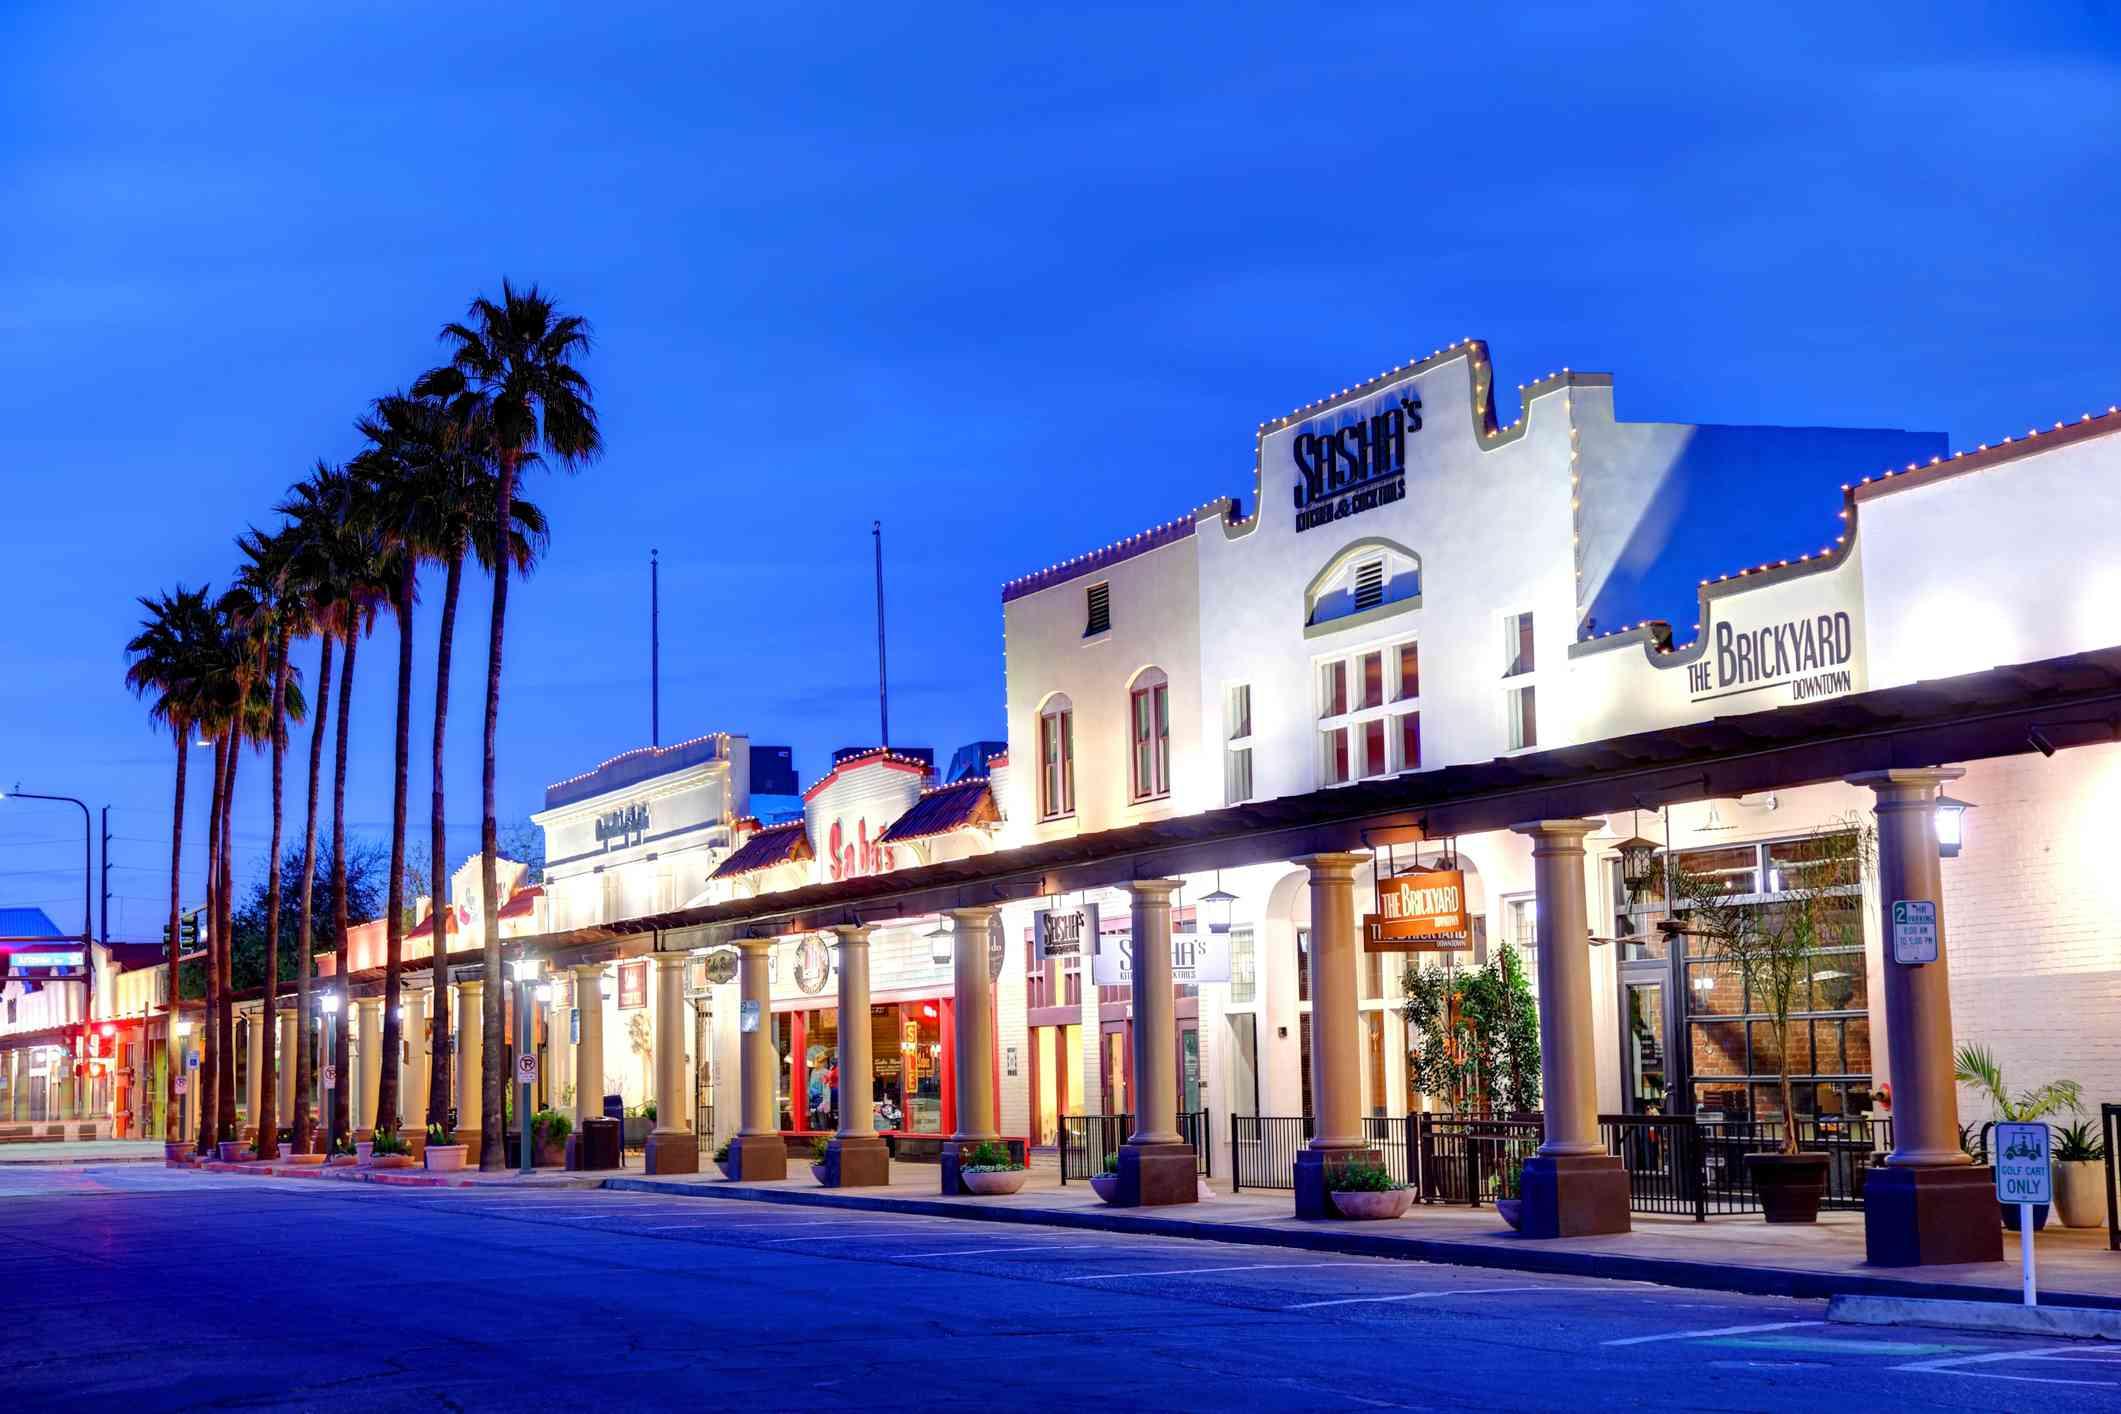 Historic Downtown Chandler, Arizona